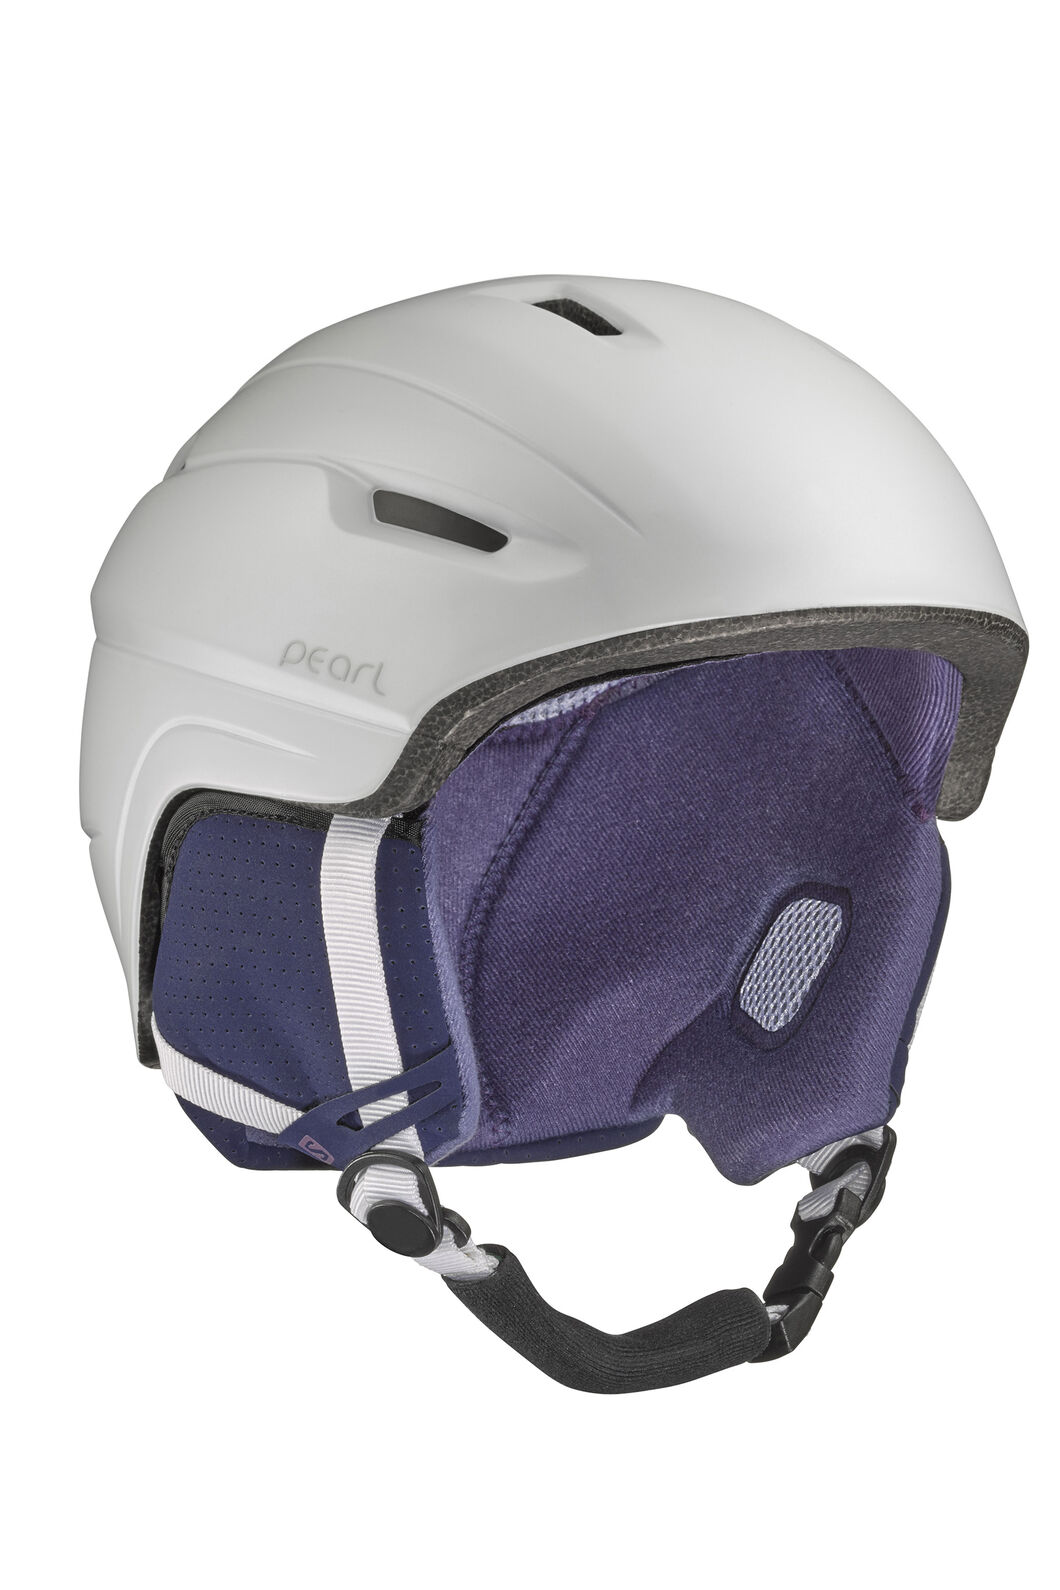 Salomon Pearl 4D Helmet — Women's, White, hi-res